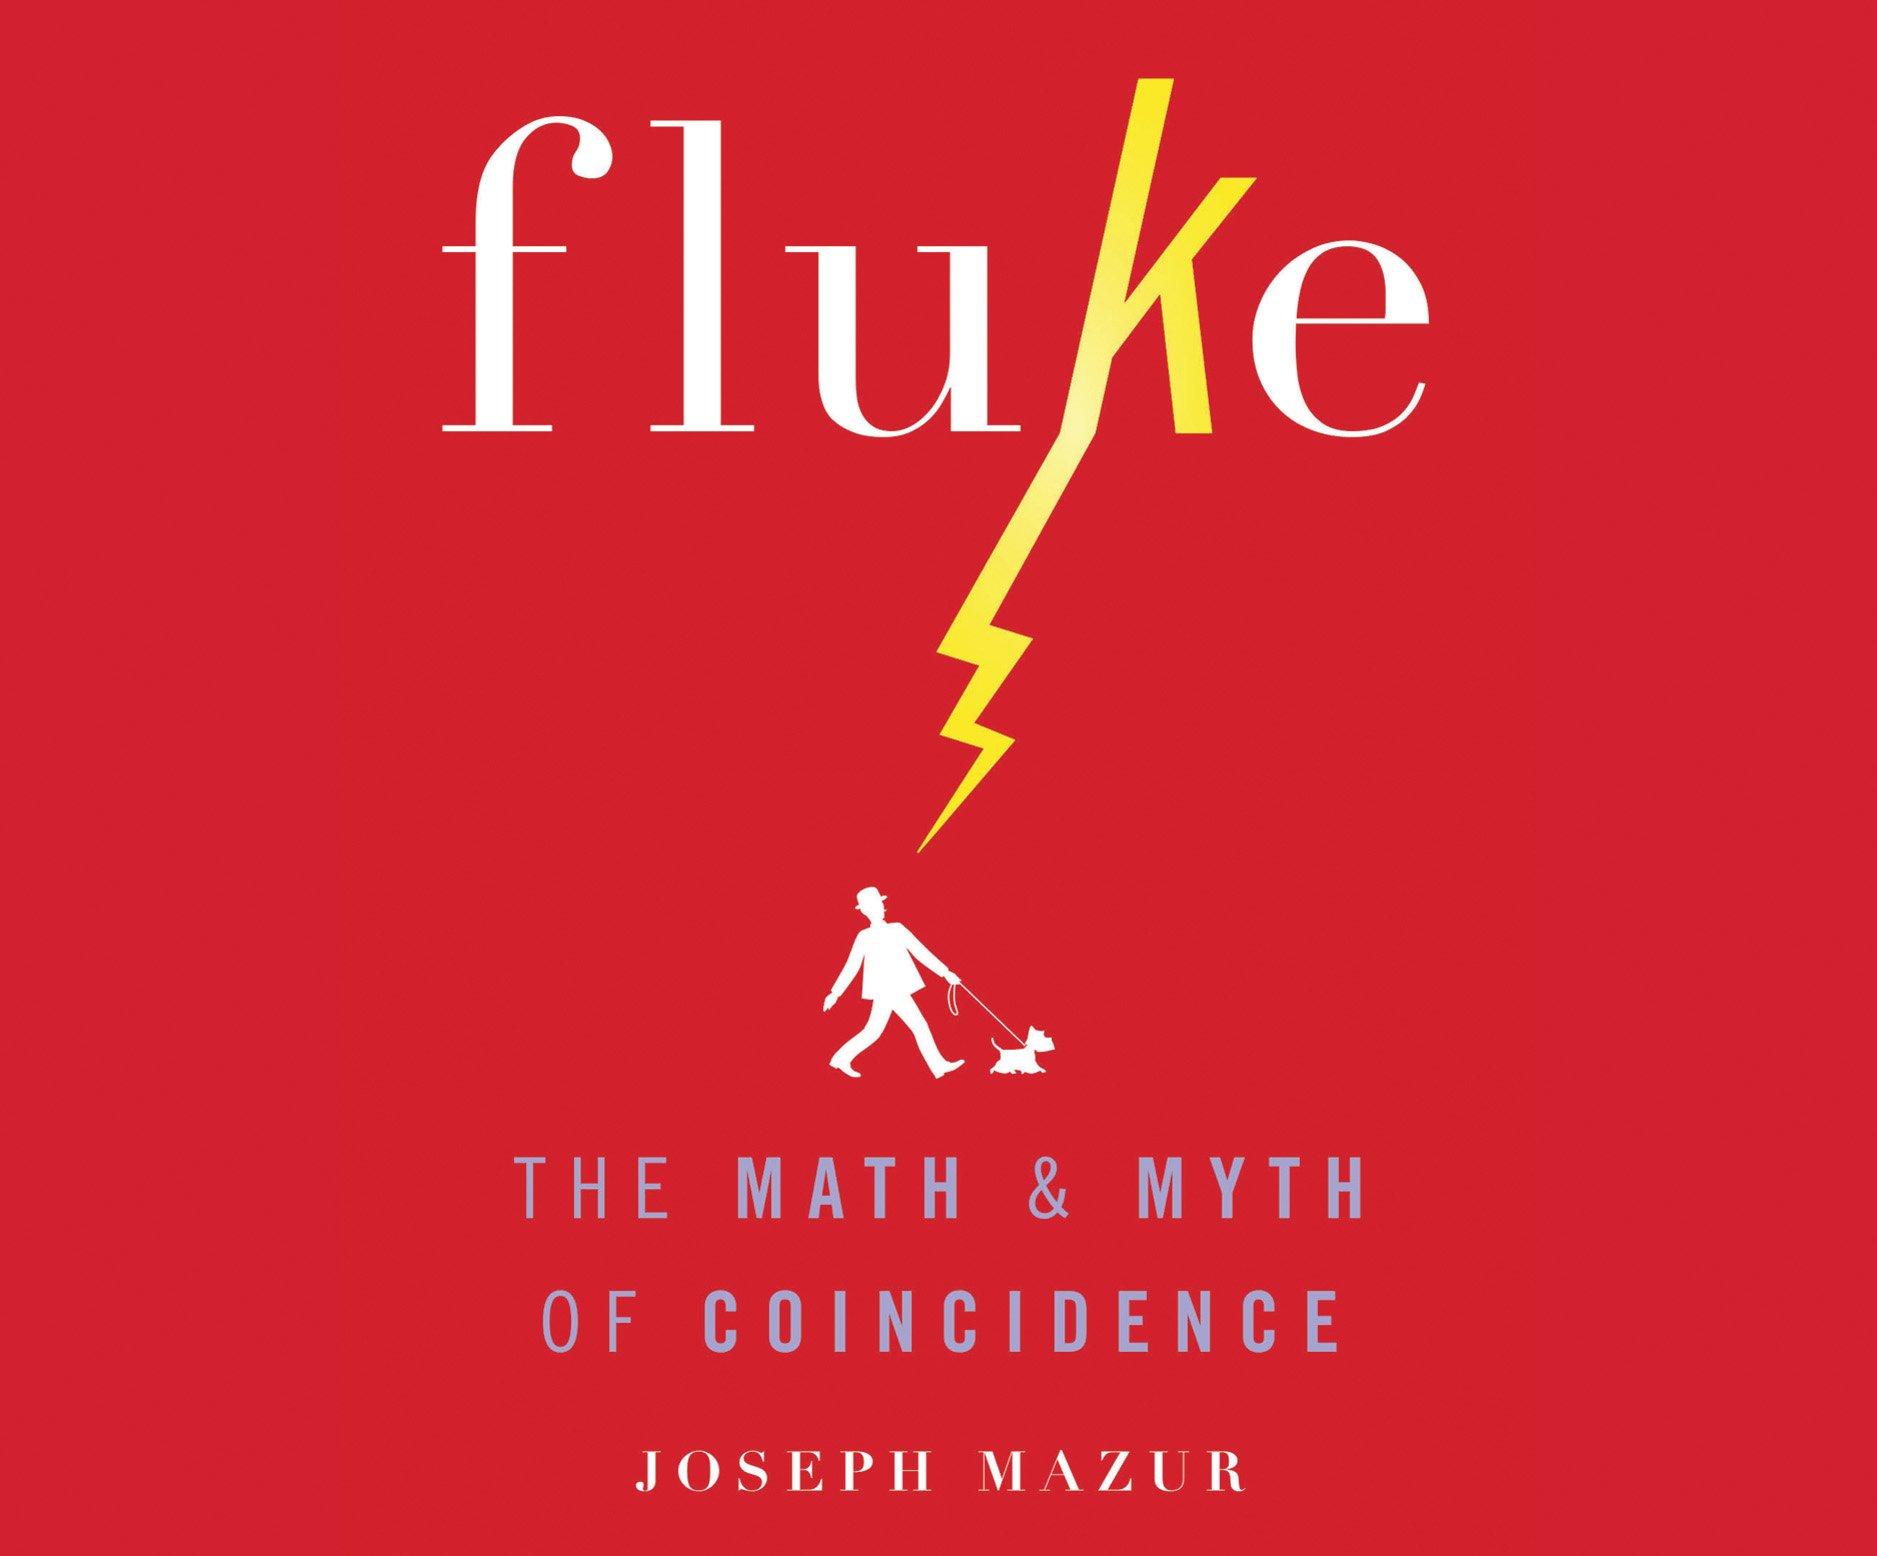 Fluke: The Math and Myth of Confidence